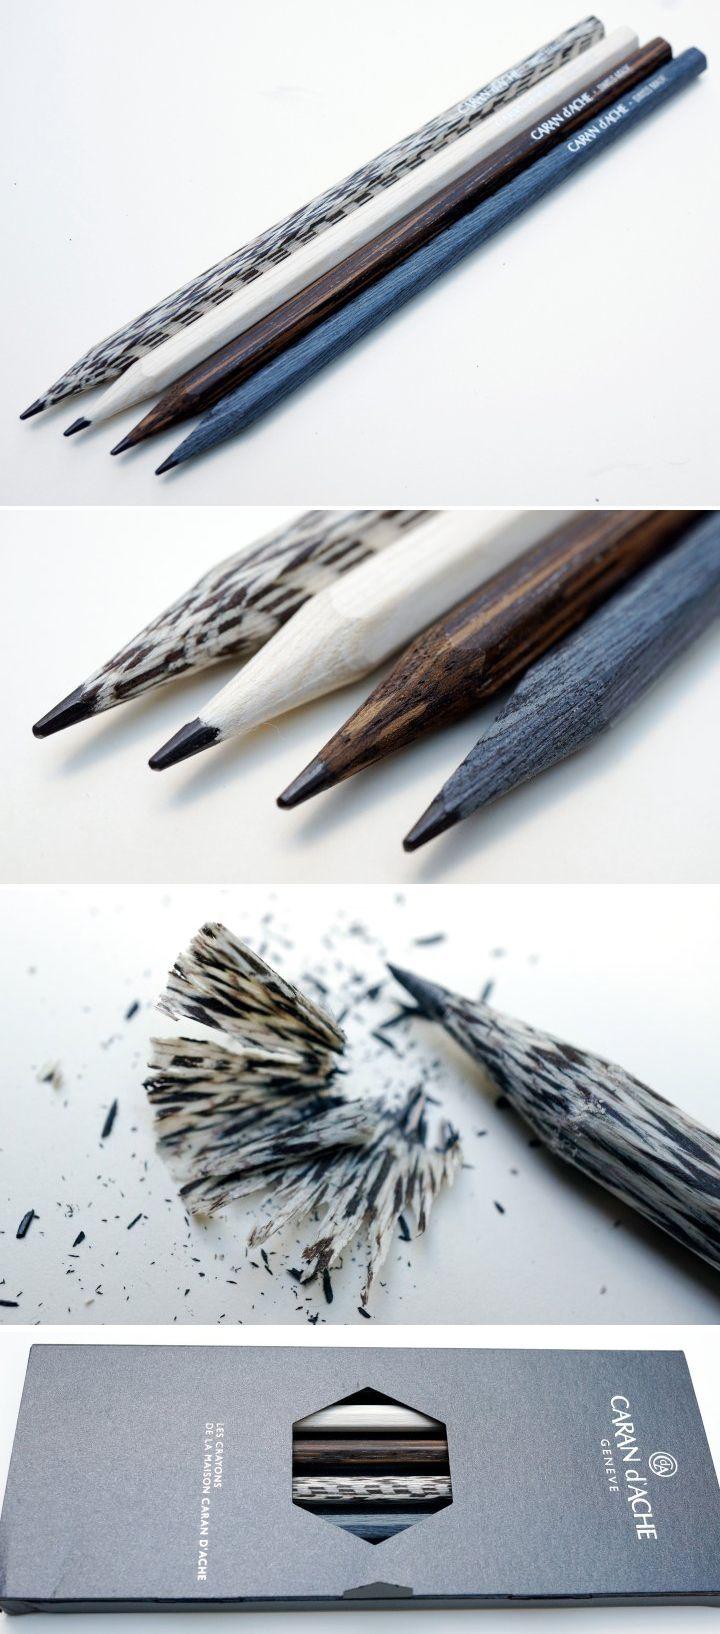 beautiful pencils made from titanium oak, macassar ebony, lati gray, and american walnut made by les crayons de la maison caran d'ache.